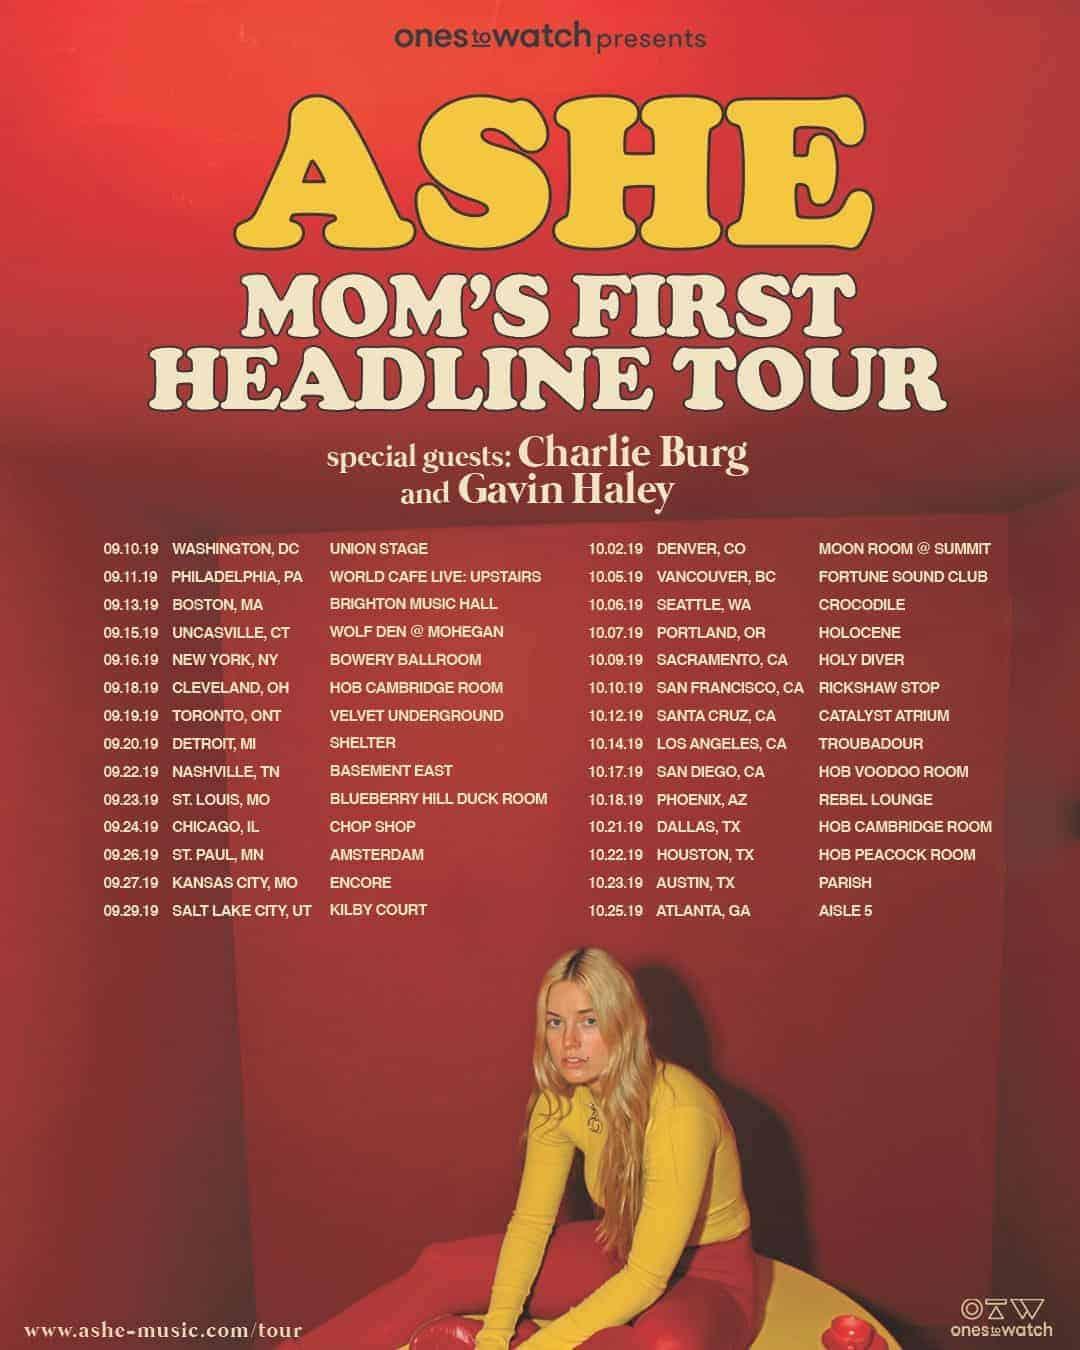 Ashe Headline Tour